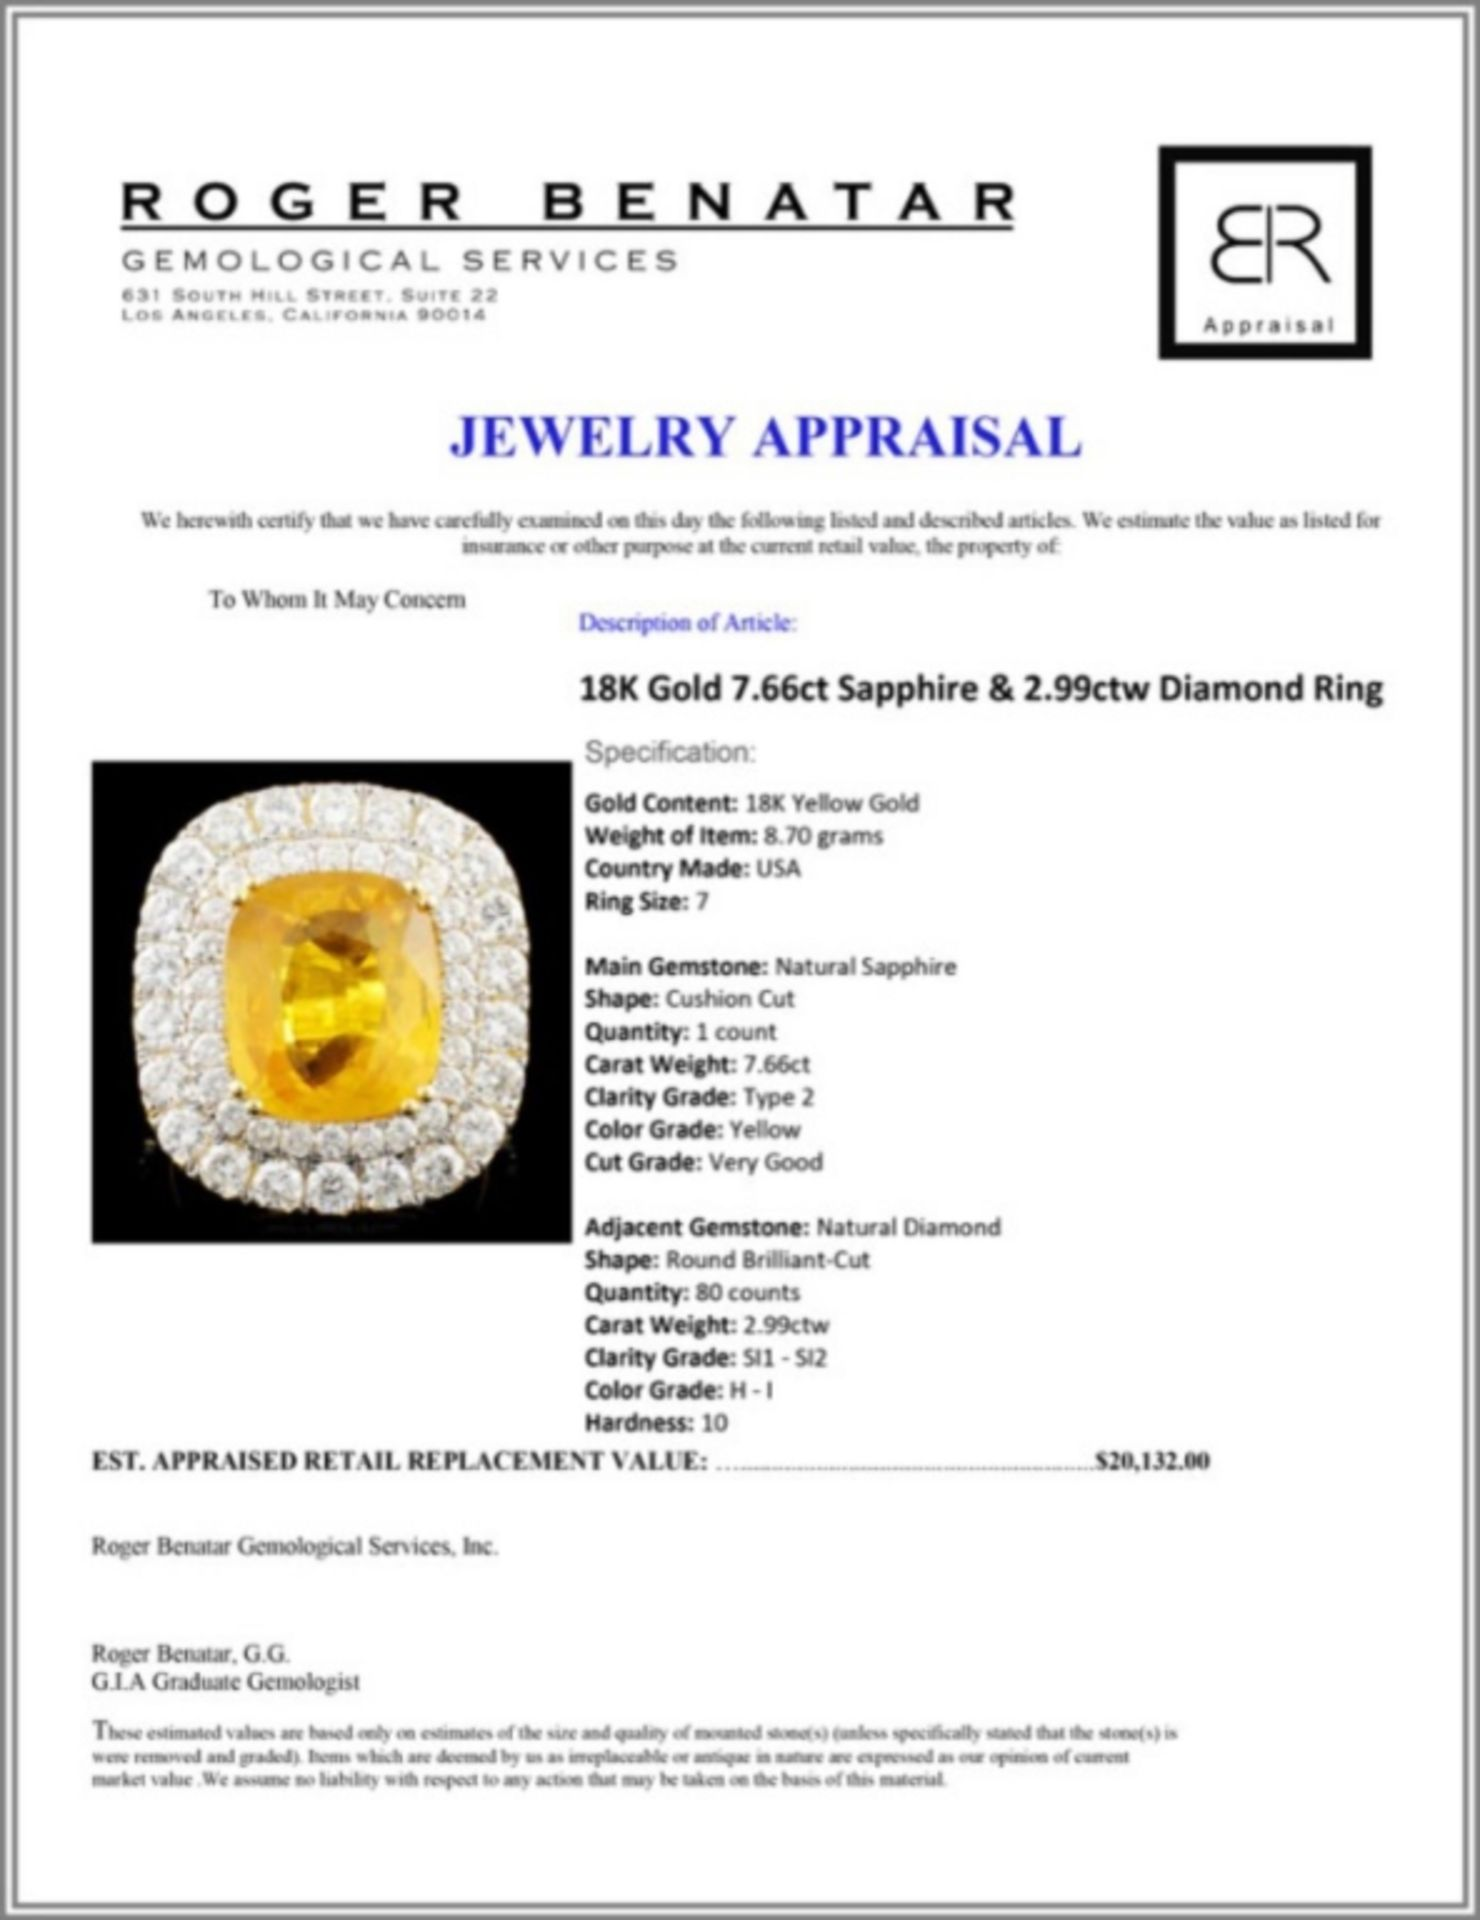 18K Gold 7.66ct Sapphire & 2.99ctw Diamond Ring - Image 5 of 5